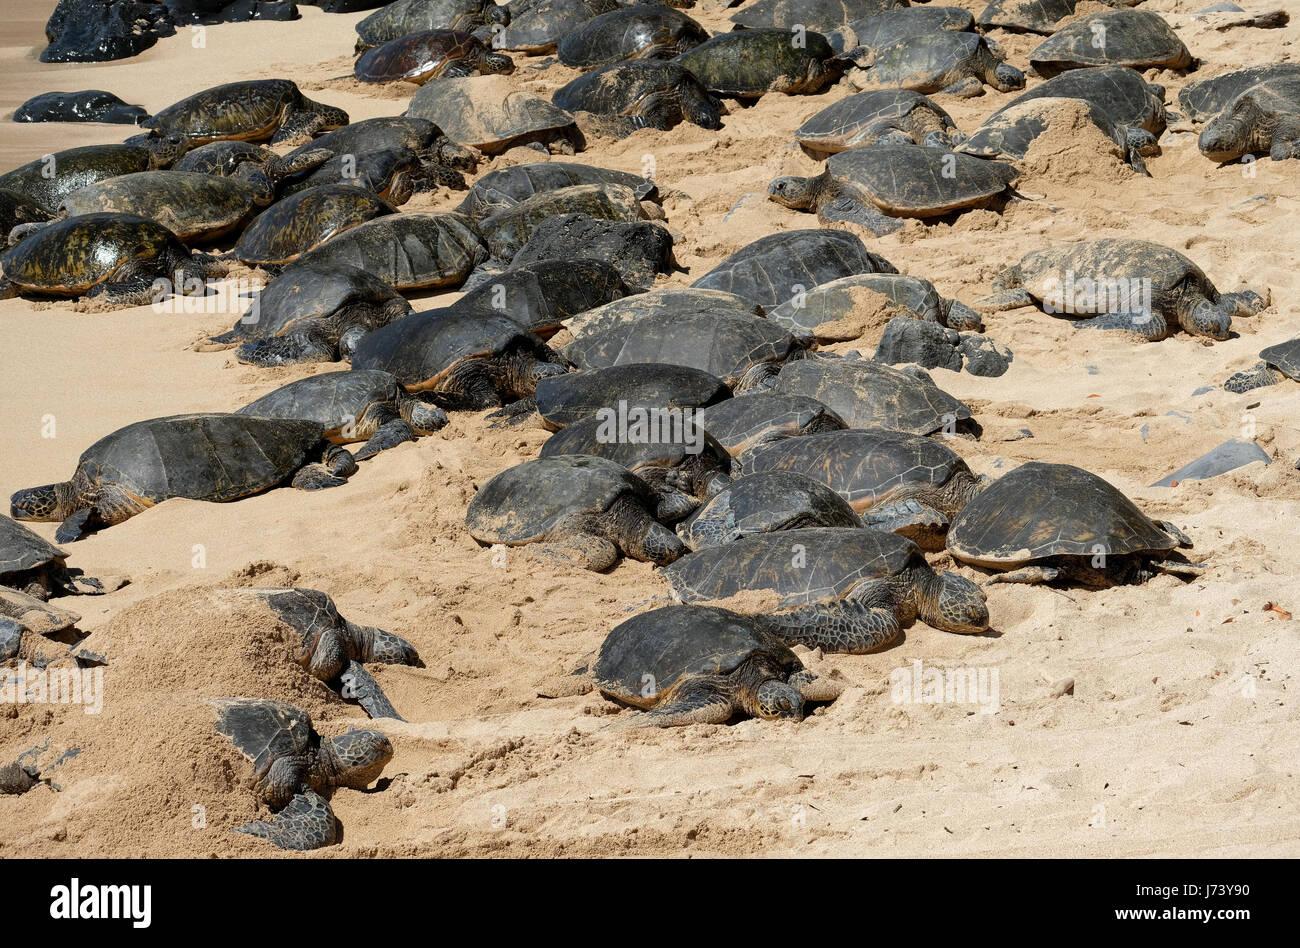 Tortugas verdes (Chelonia mydas) descansando en la playa de Ho'okipa Beach Park, Paia, Maui, Hawaii. Imagen De Stock